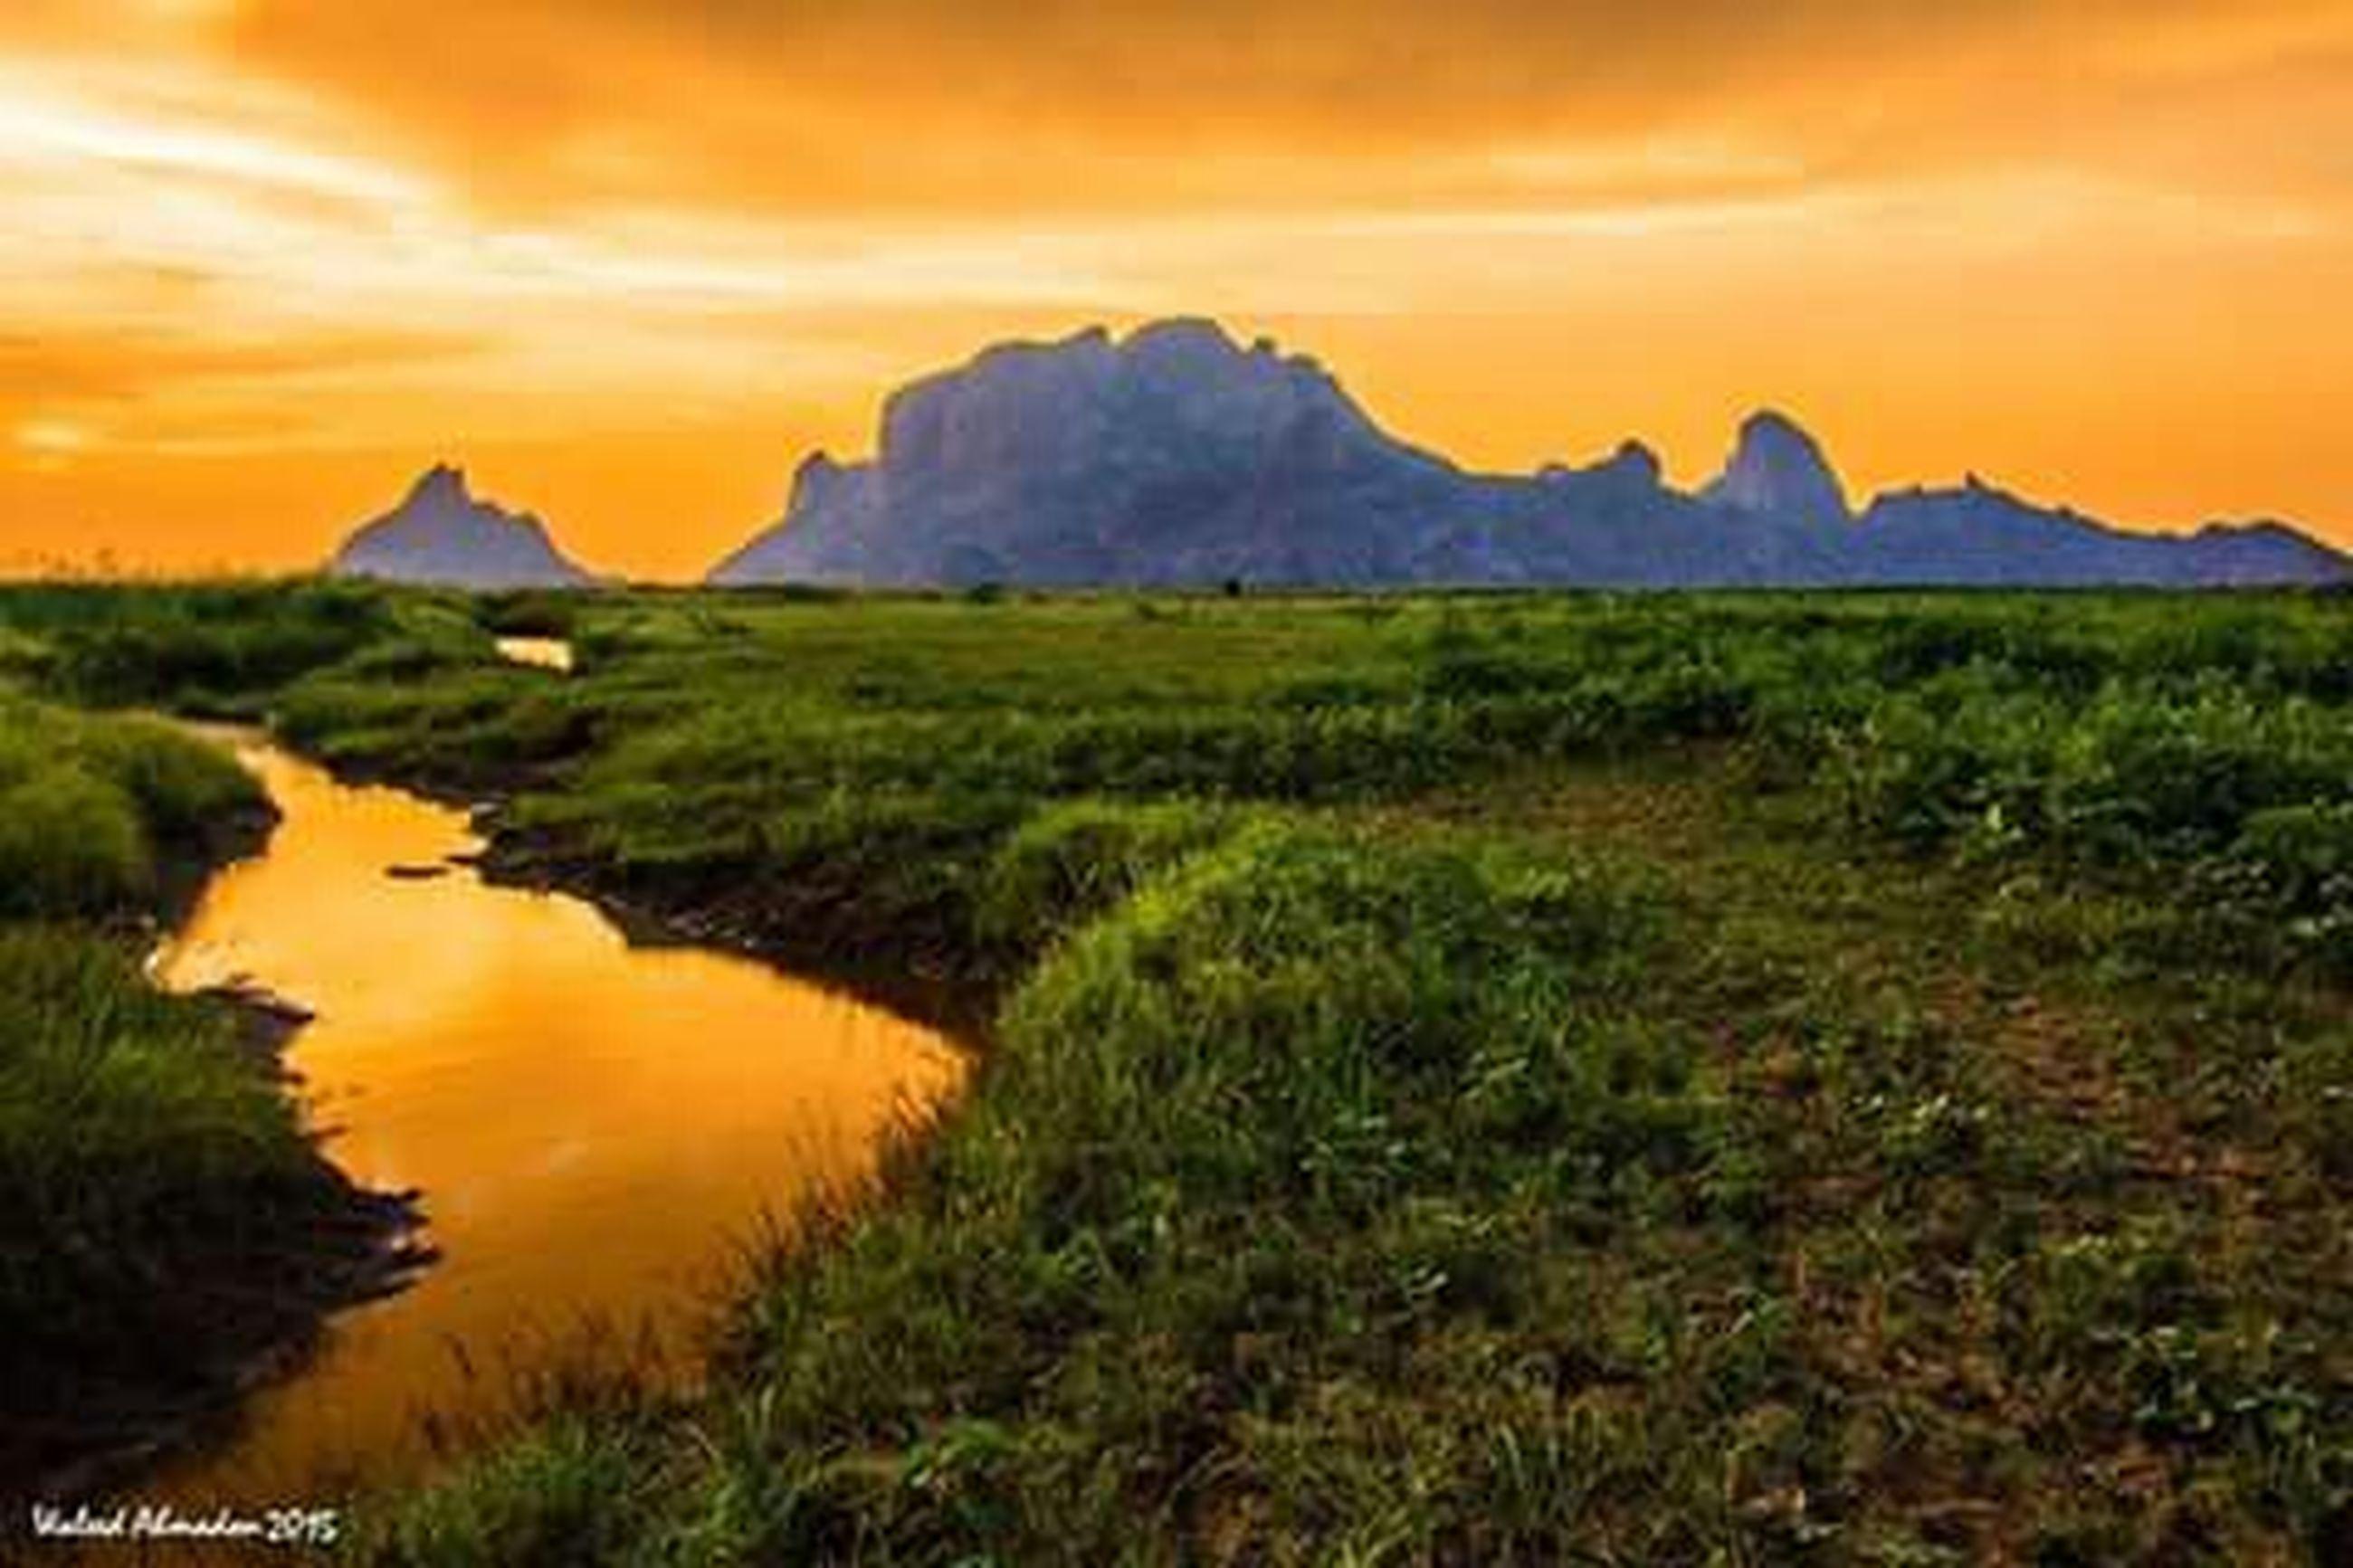 sunset, tranquil scene, scenics, tranquility, beauty in nature, mountain, sky, landscape, orange color, nature, idyllic, grass, mountain range, cloud - sky, non-urban scene, water, majestic, cloud, remote, dramatic sky